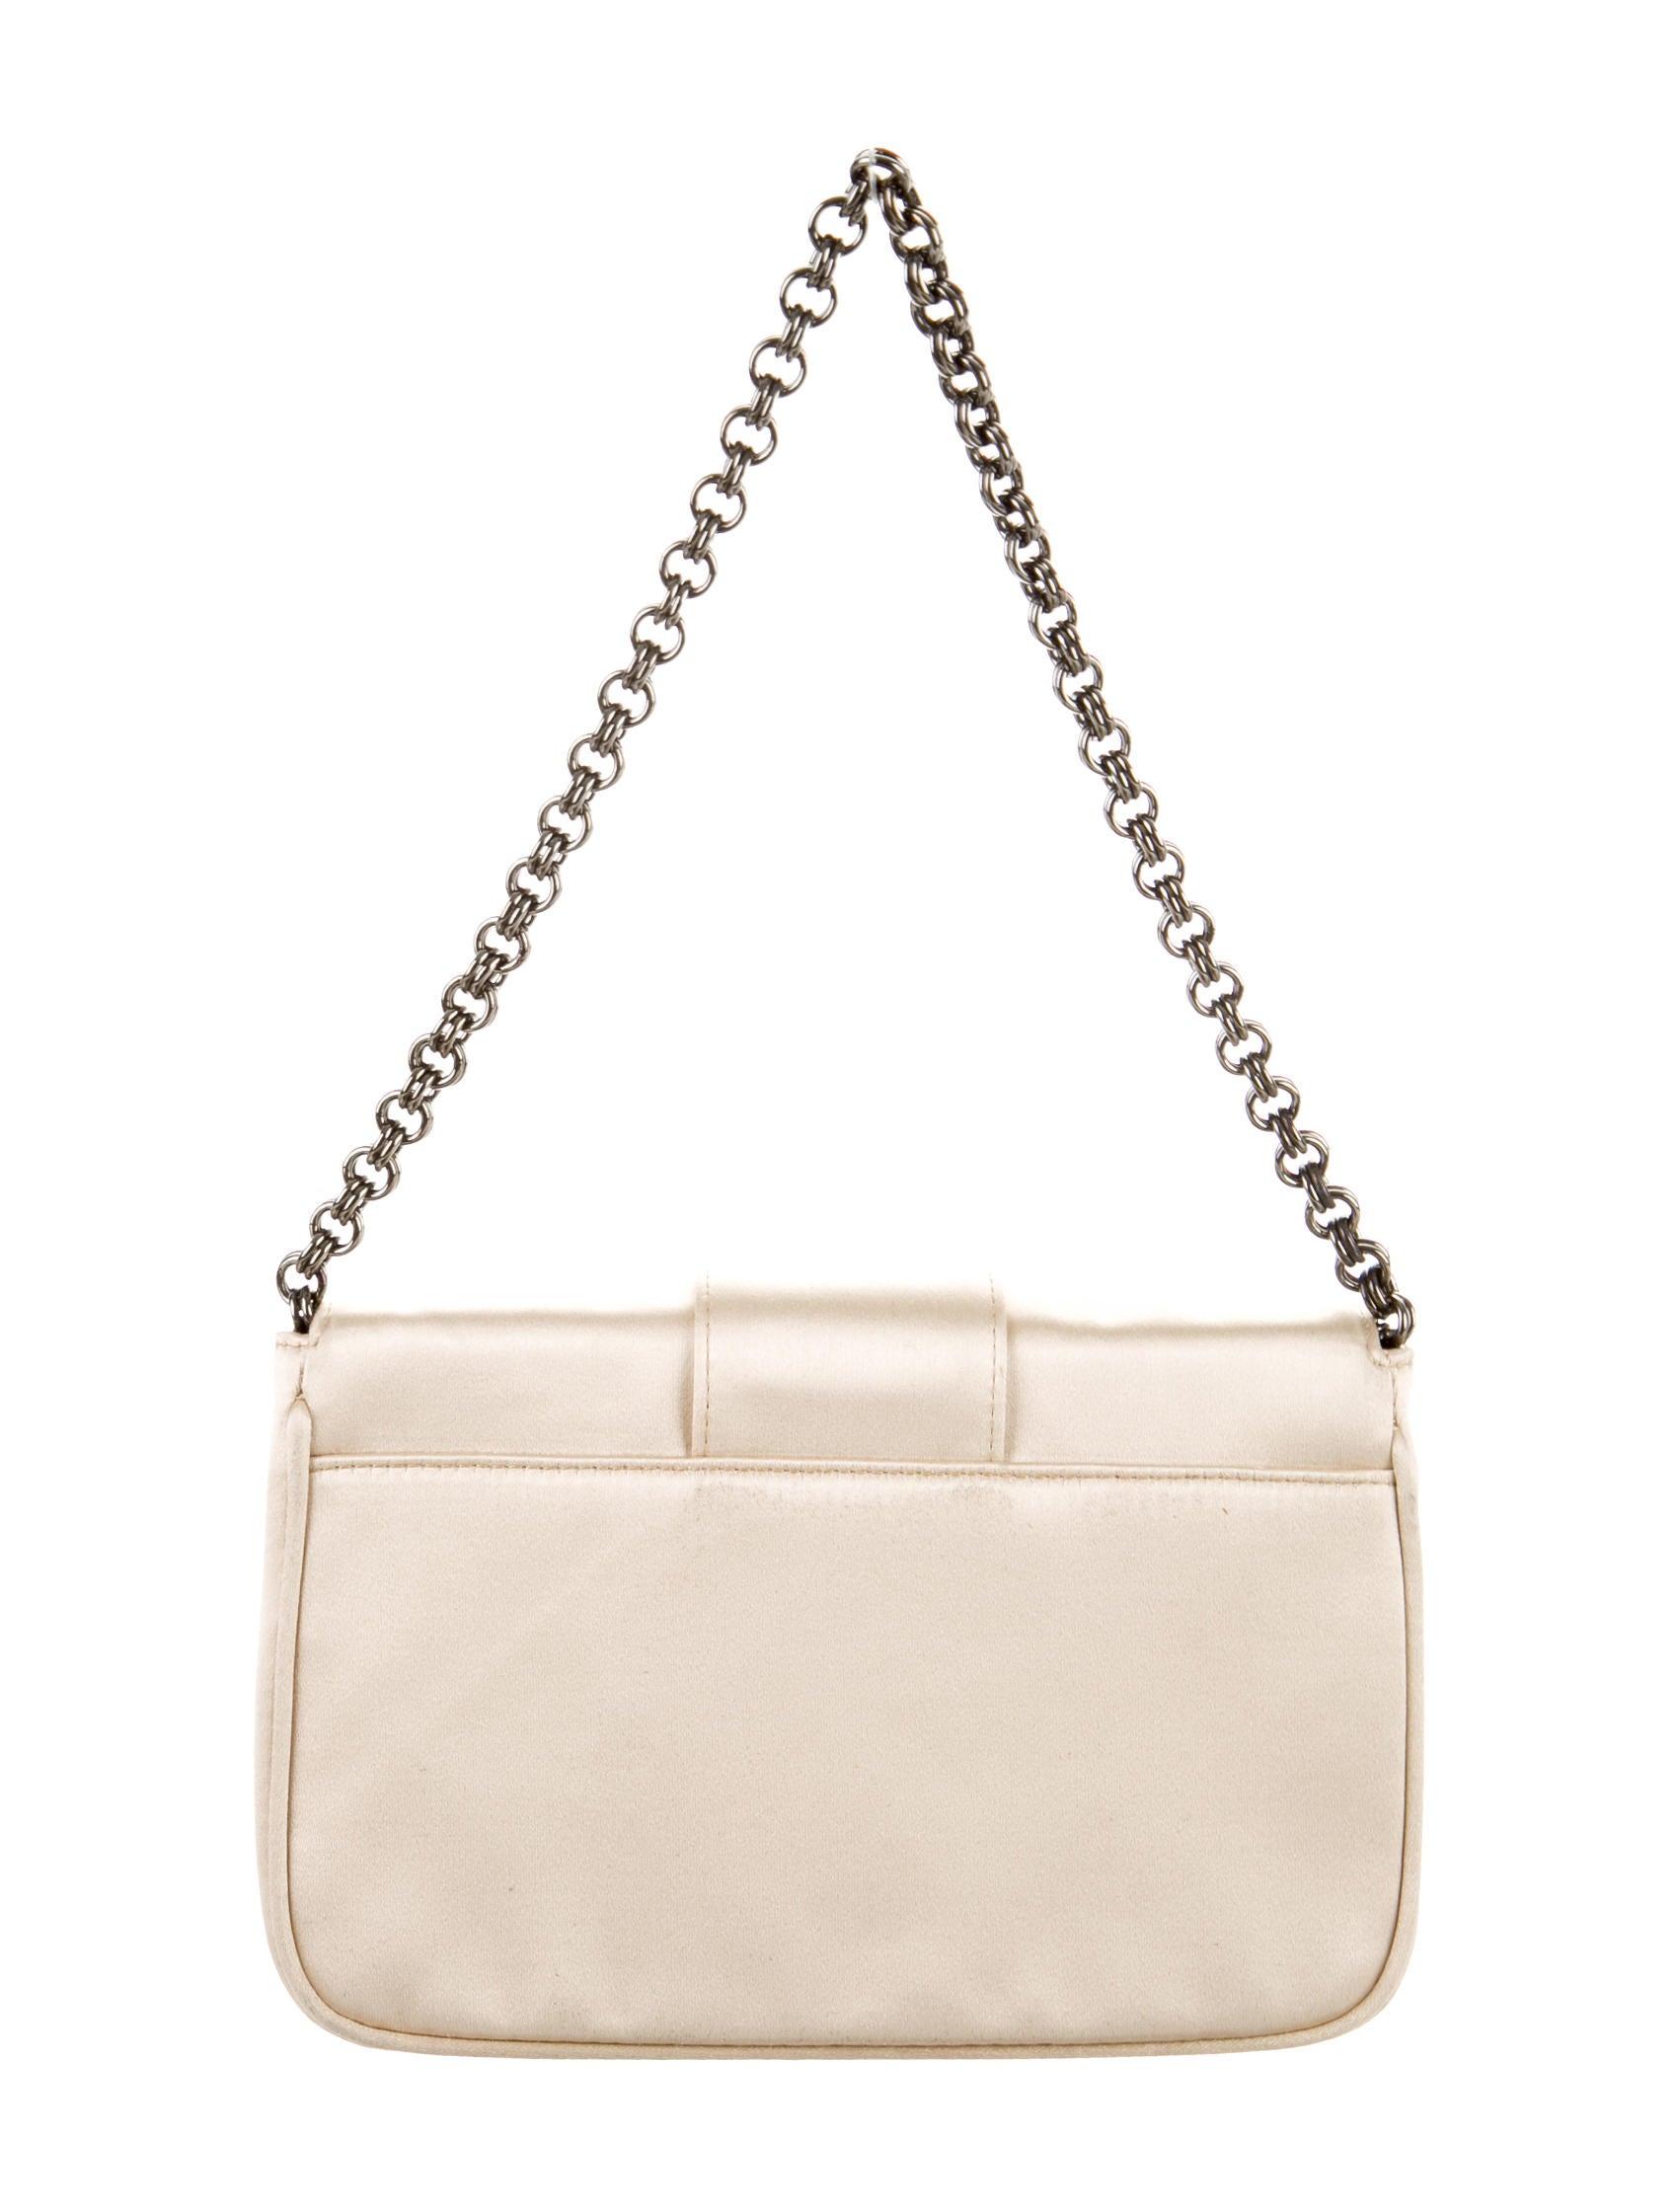 0558c1ebe549 prada fringe tote bag - Prada Embellished Satin Clutch - Handbags -  PRA81636